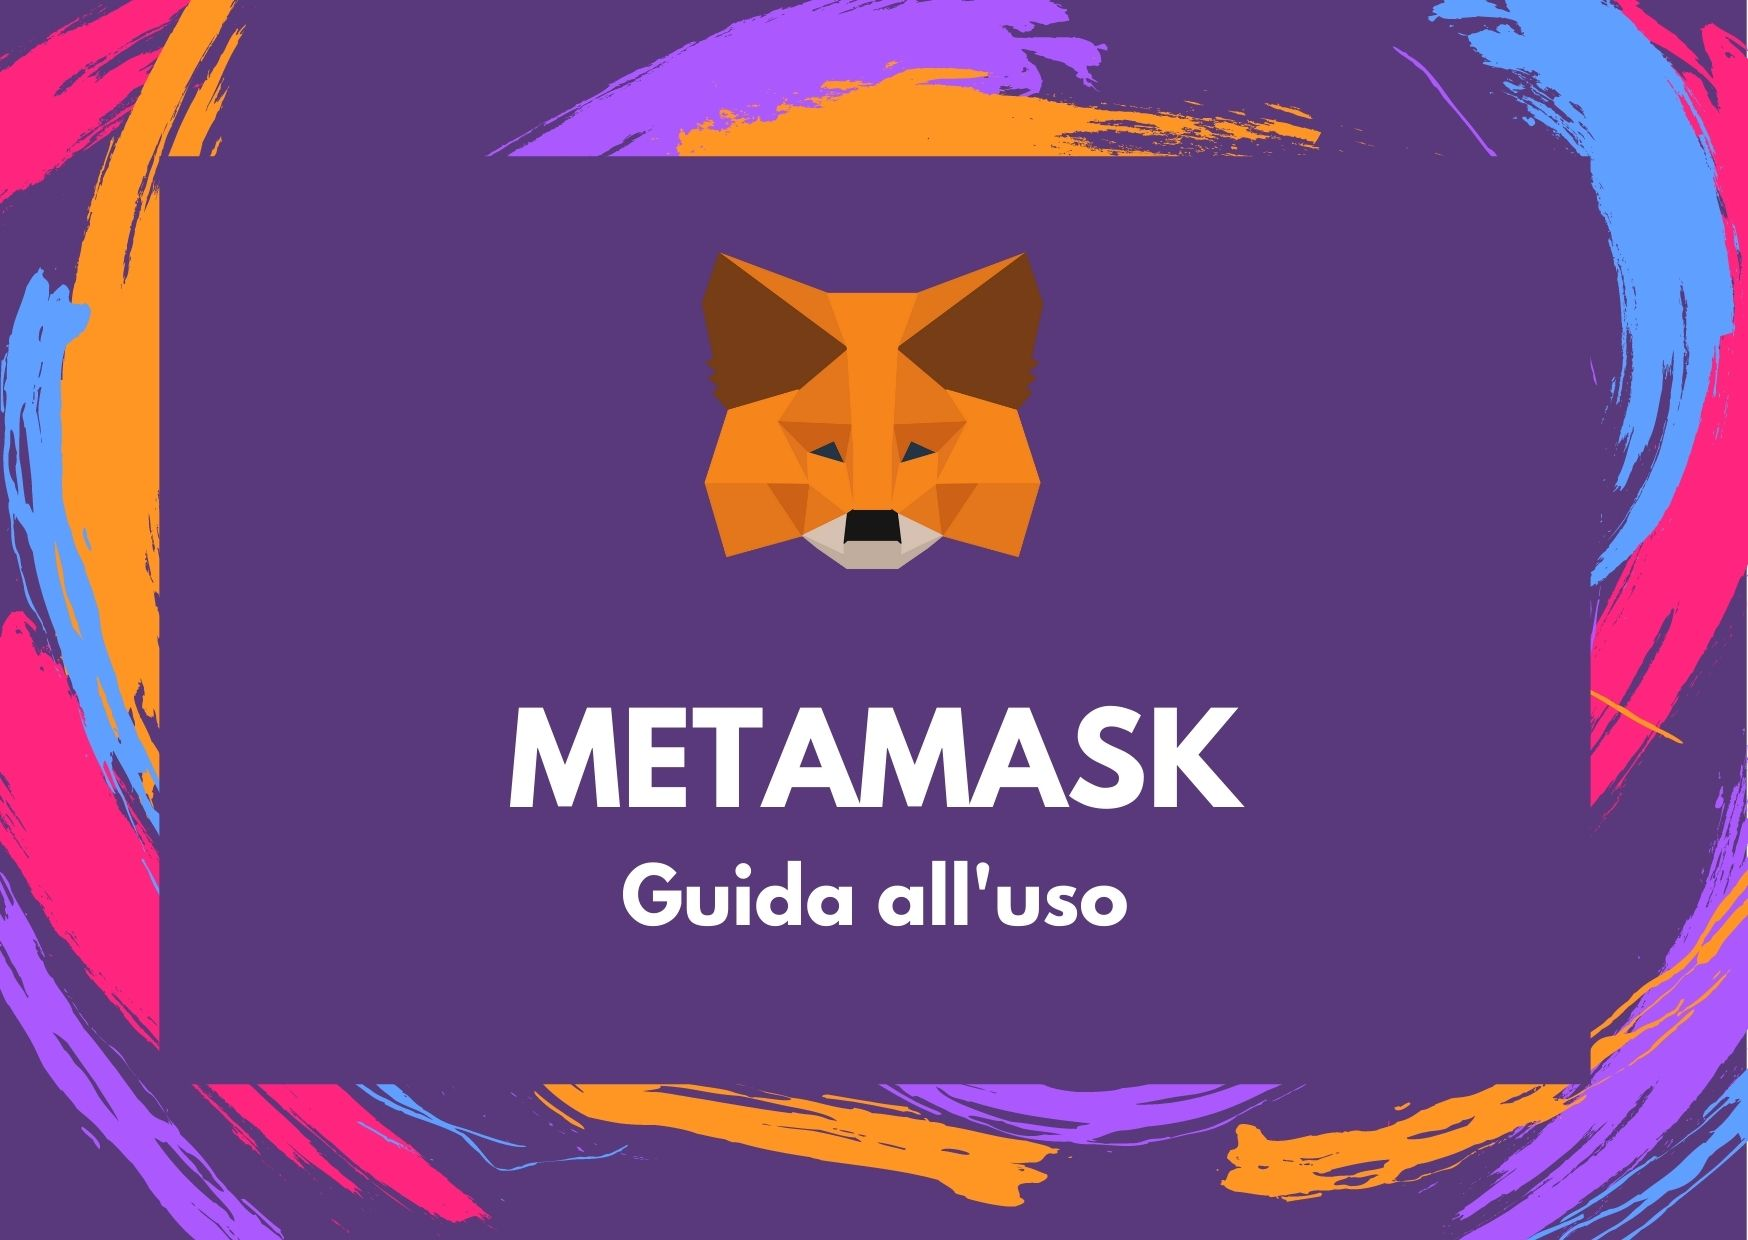 METAMASK Guida all'uso